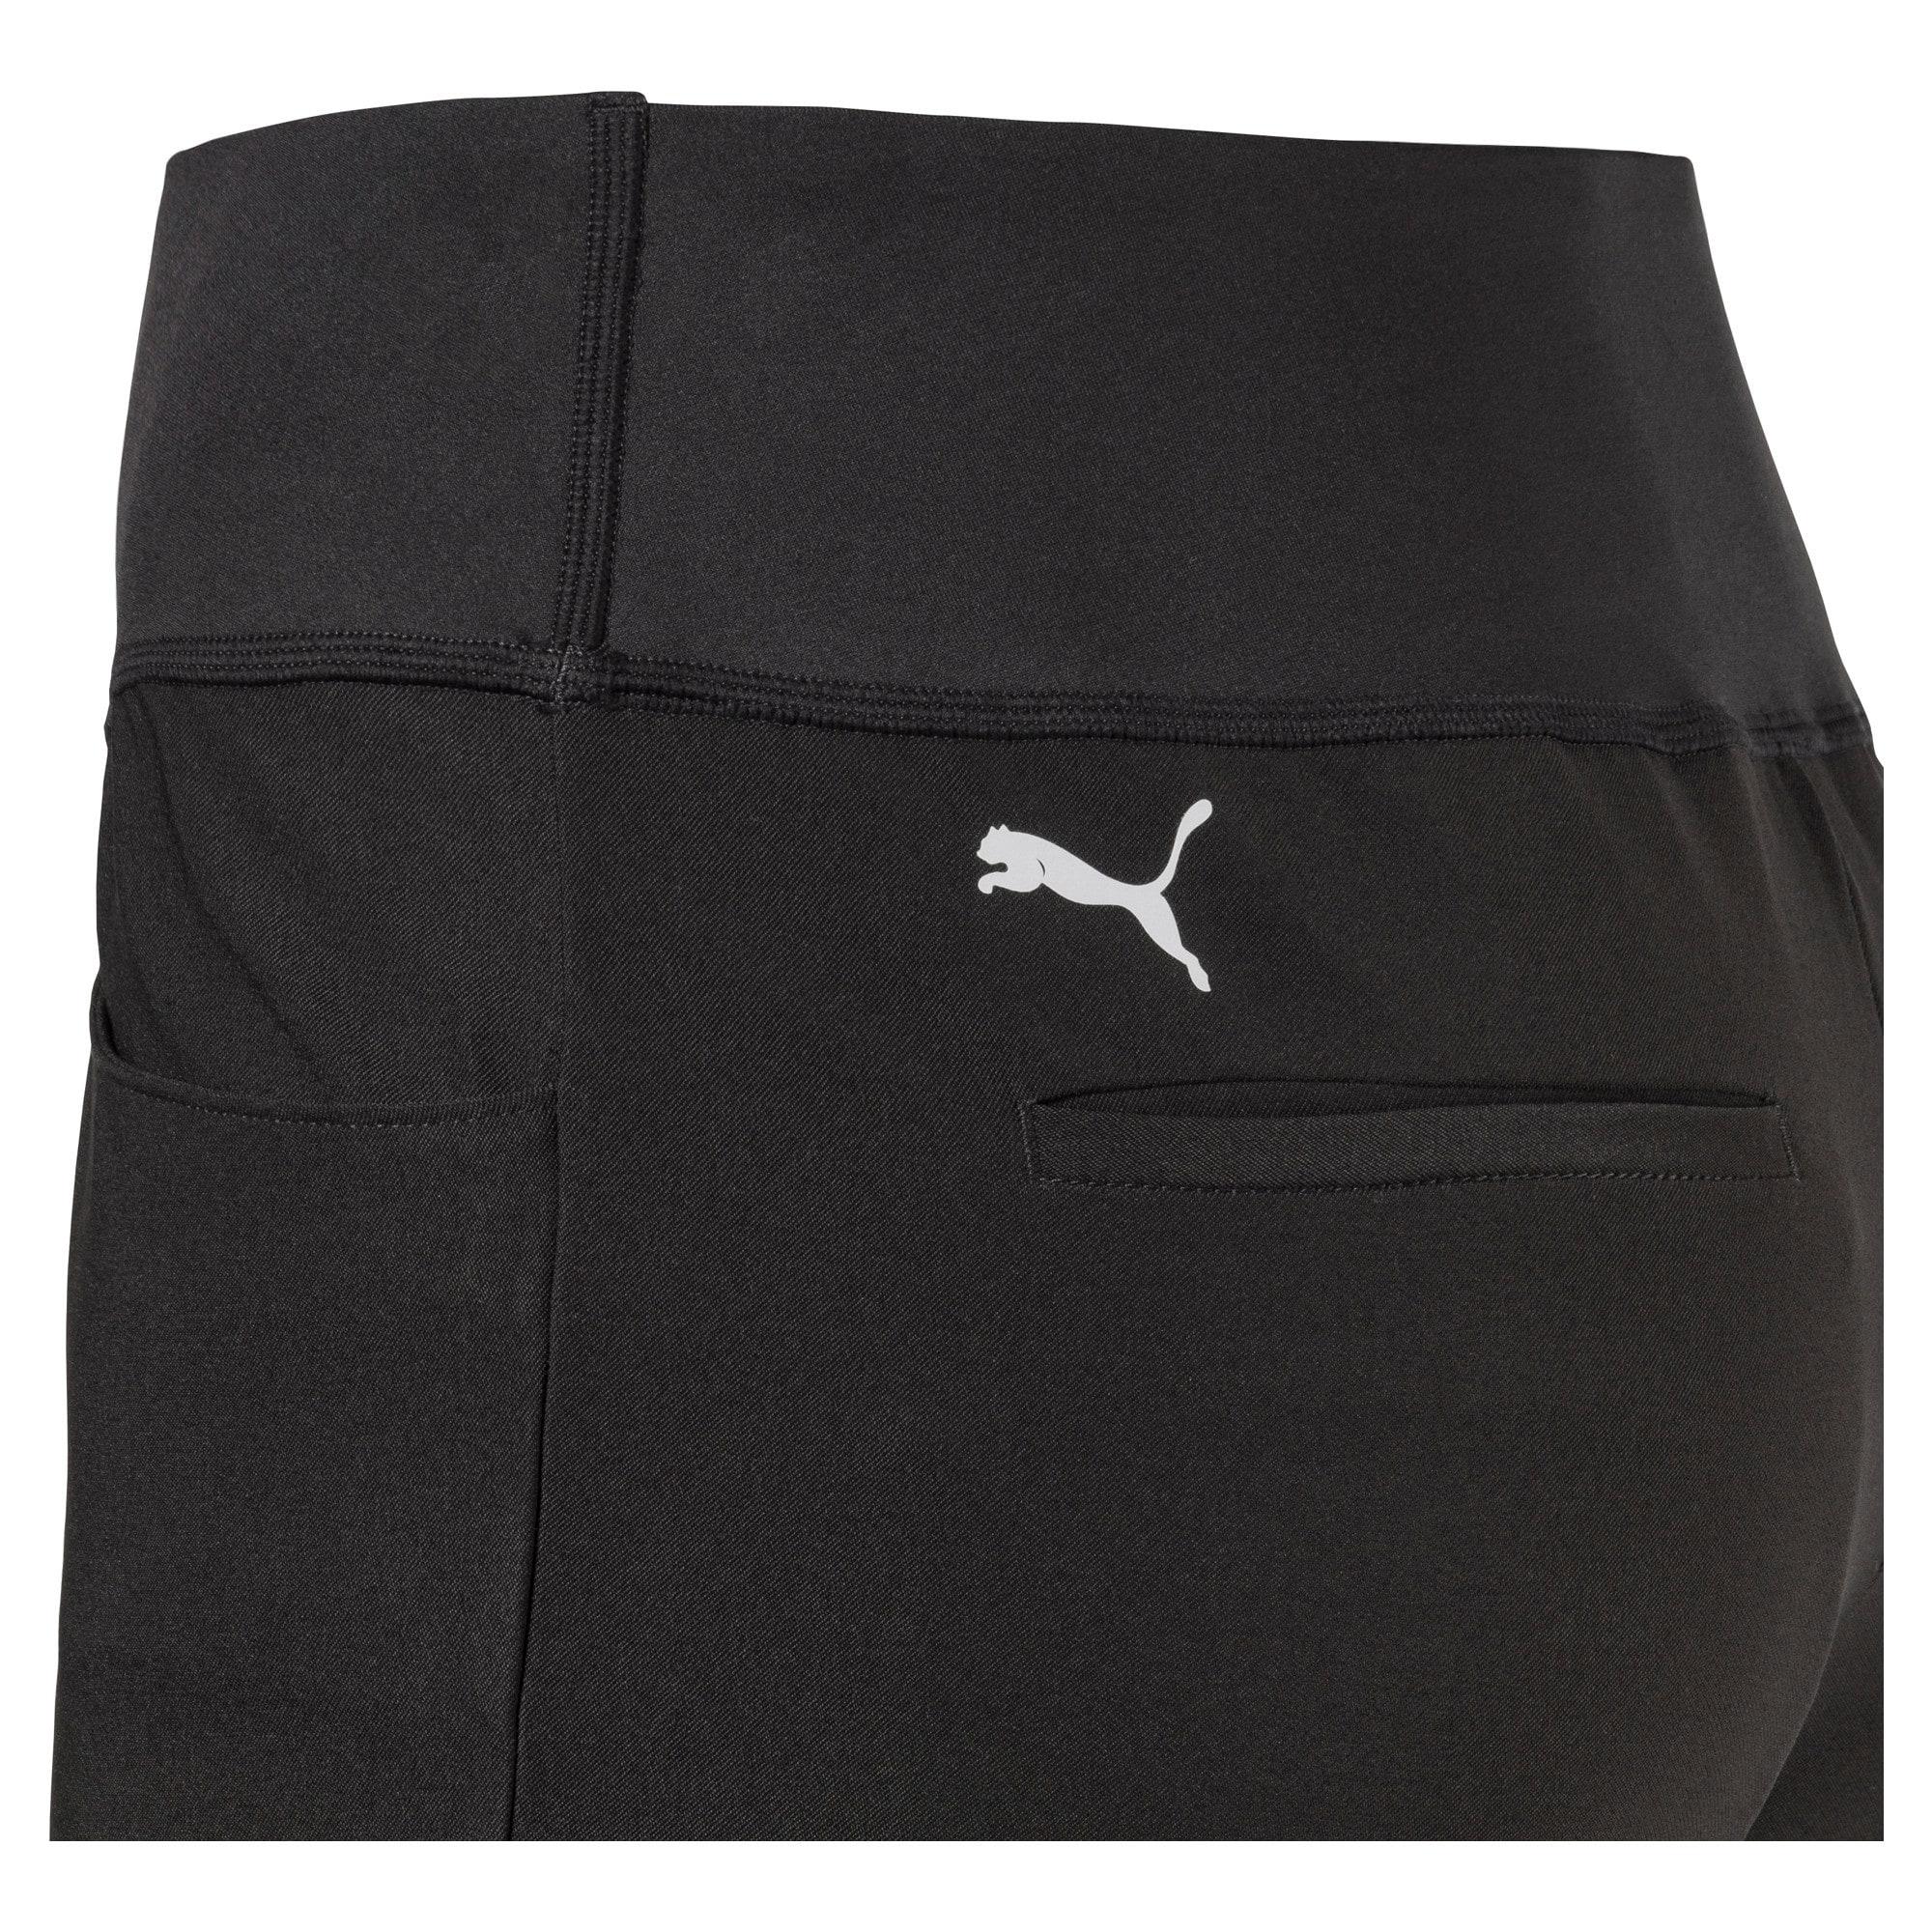 Thumbnail 6 of Golf Women's PWRSHAPE Pull On Pants, Puma Black, medium